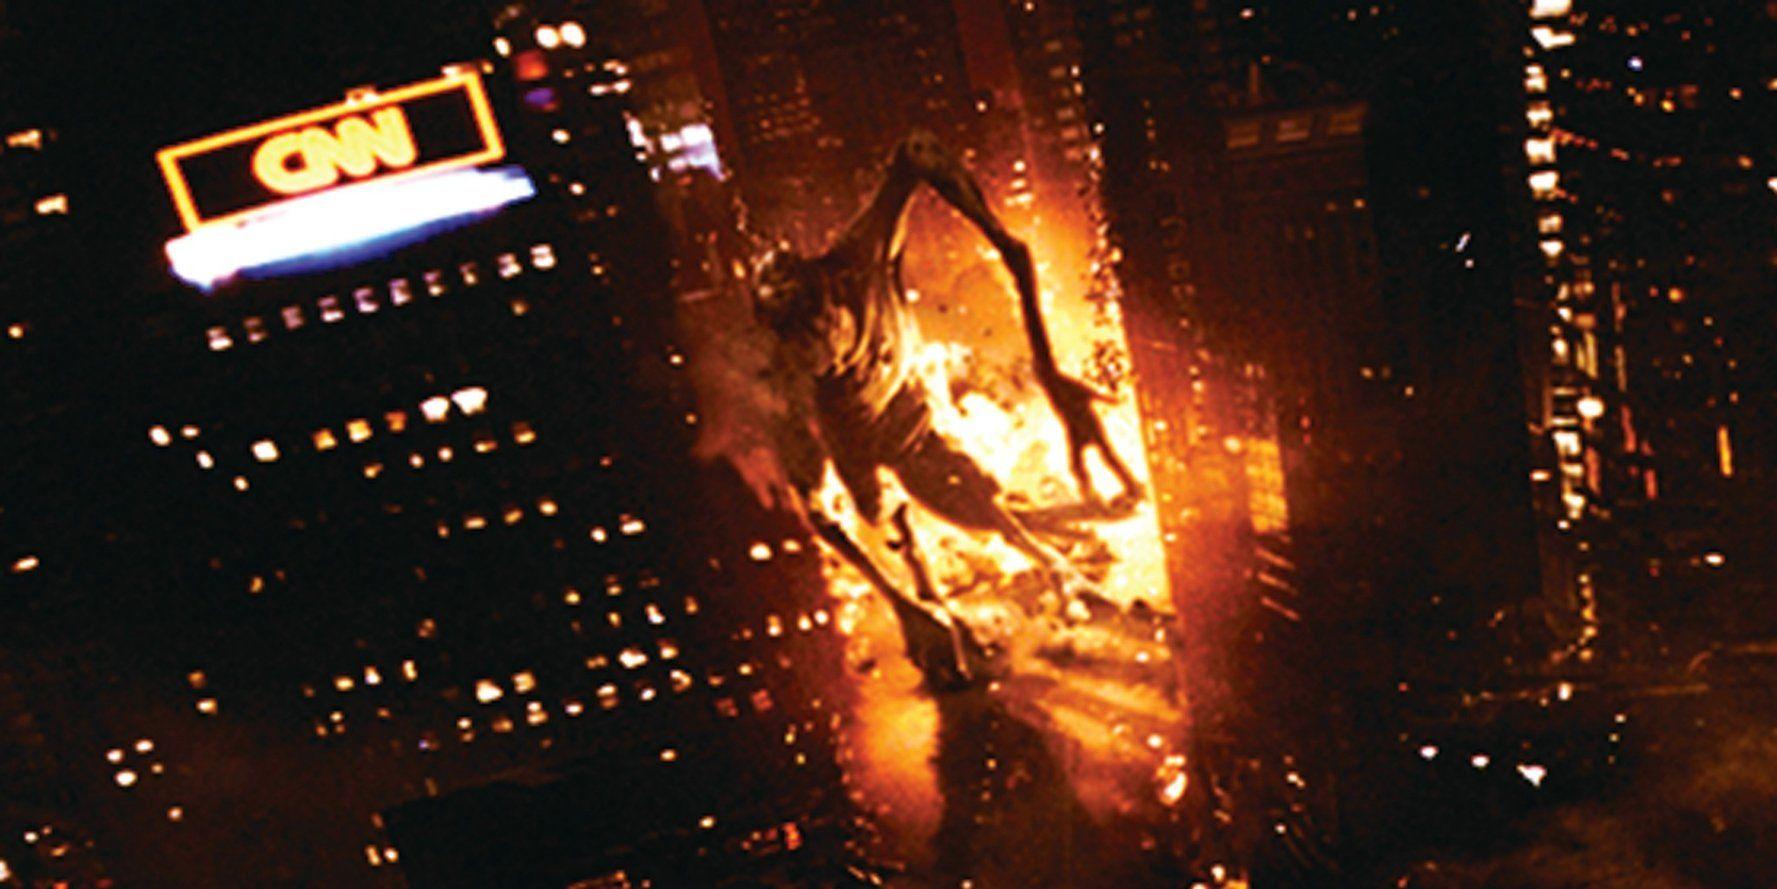 Cloverfield 2008 Imdb Godzilla Mothra Cloverfield